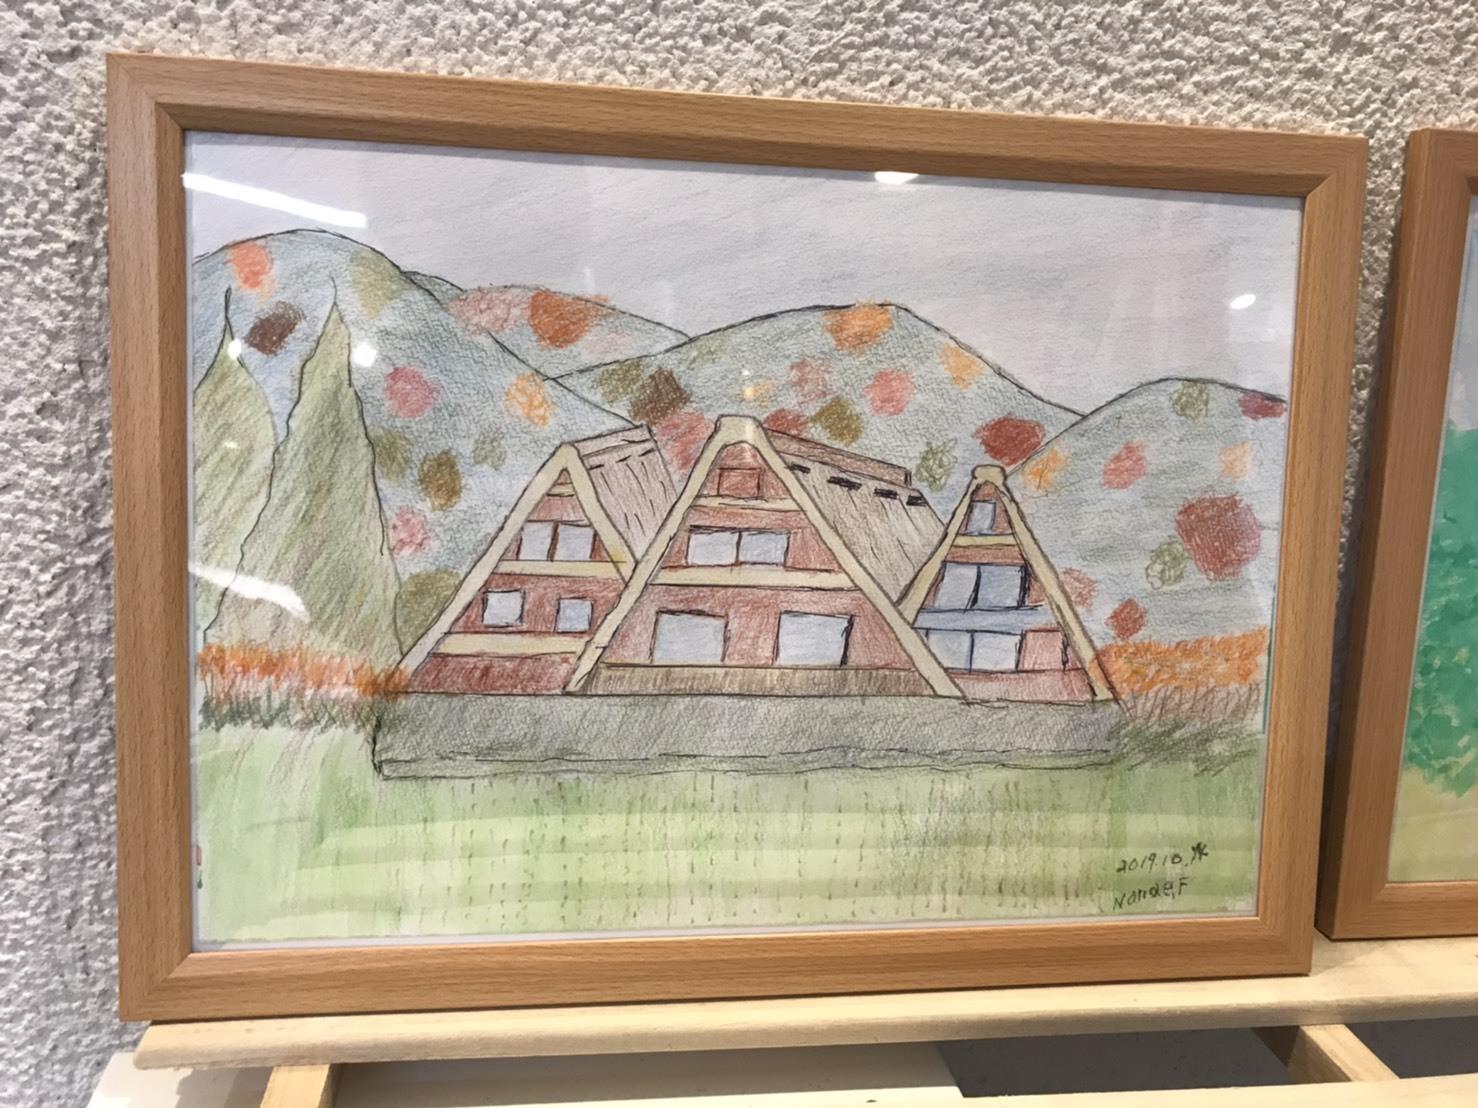 Nanaeギャラリー part40 〜白川郷の茅葺〜_f0283066_19001685.jpg